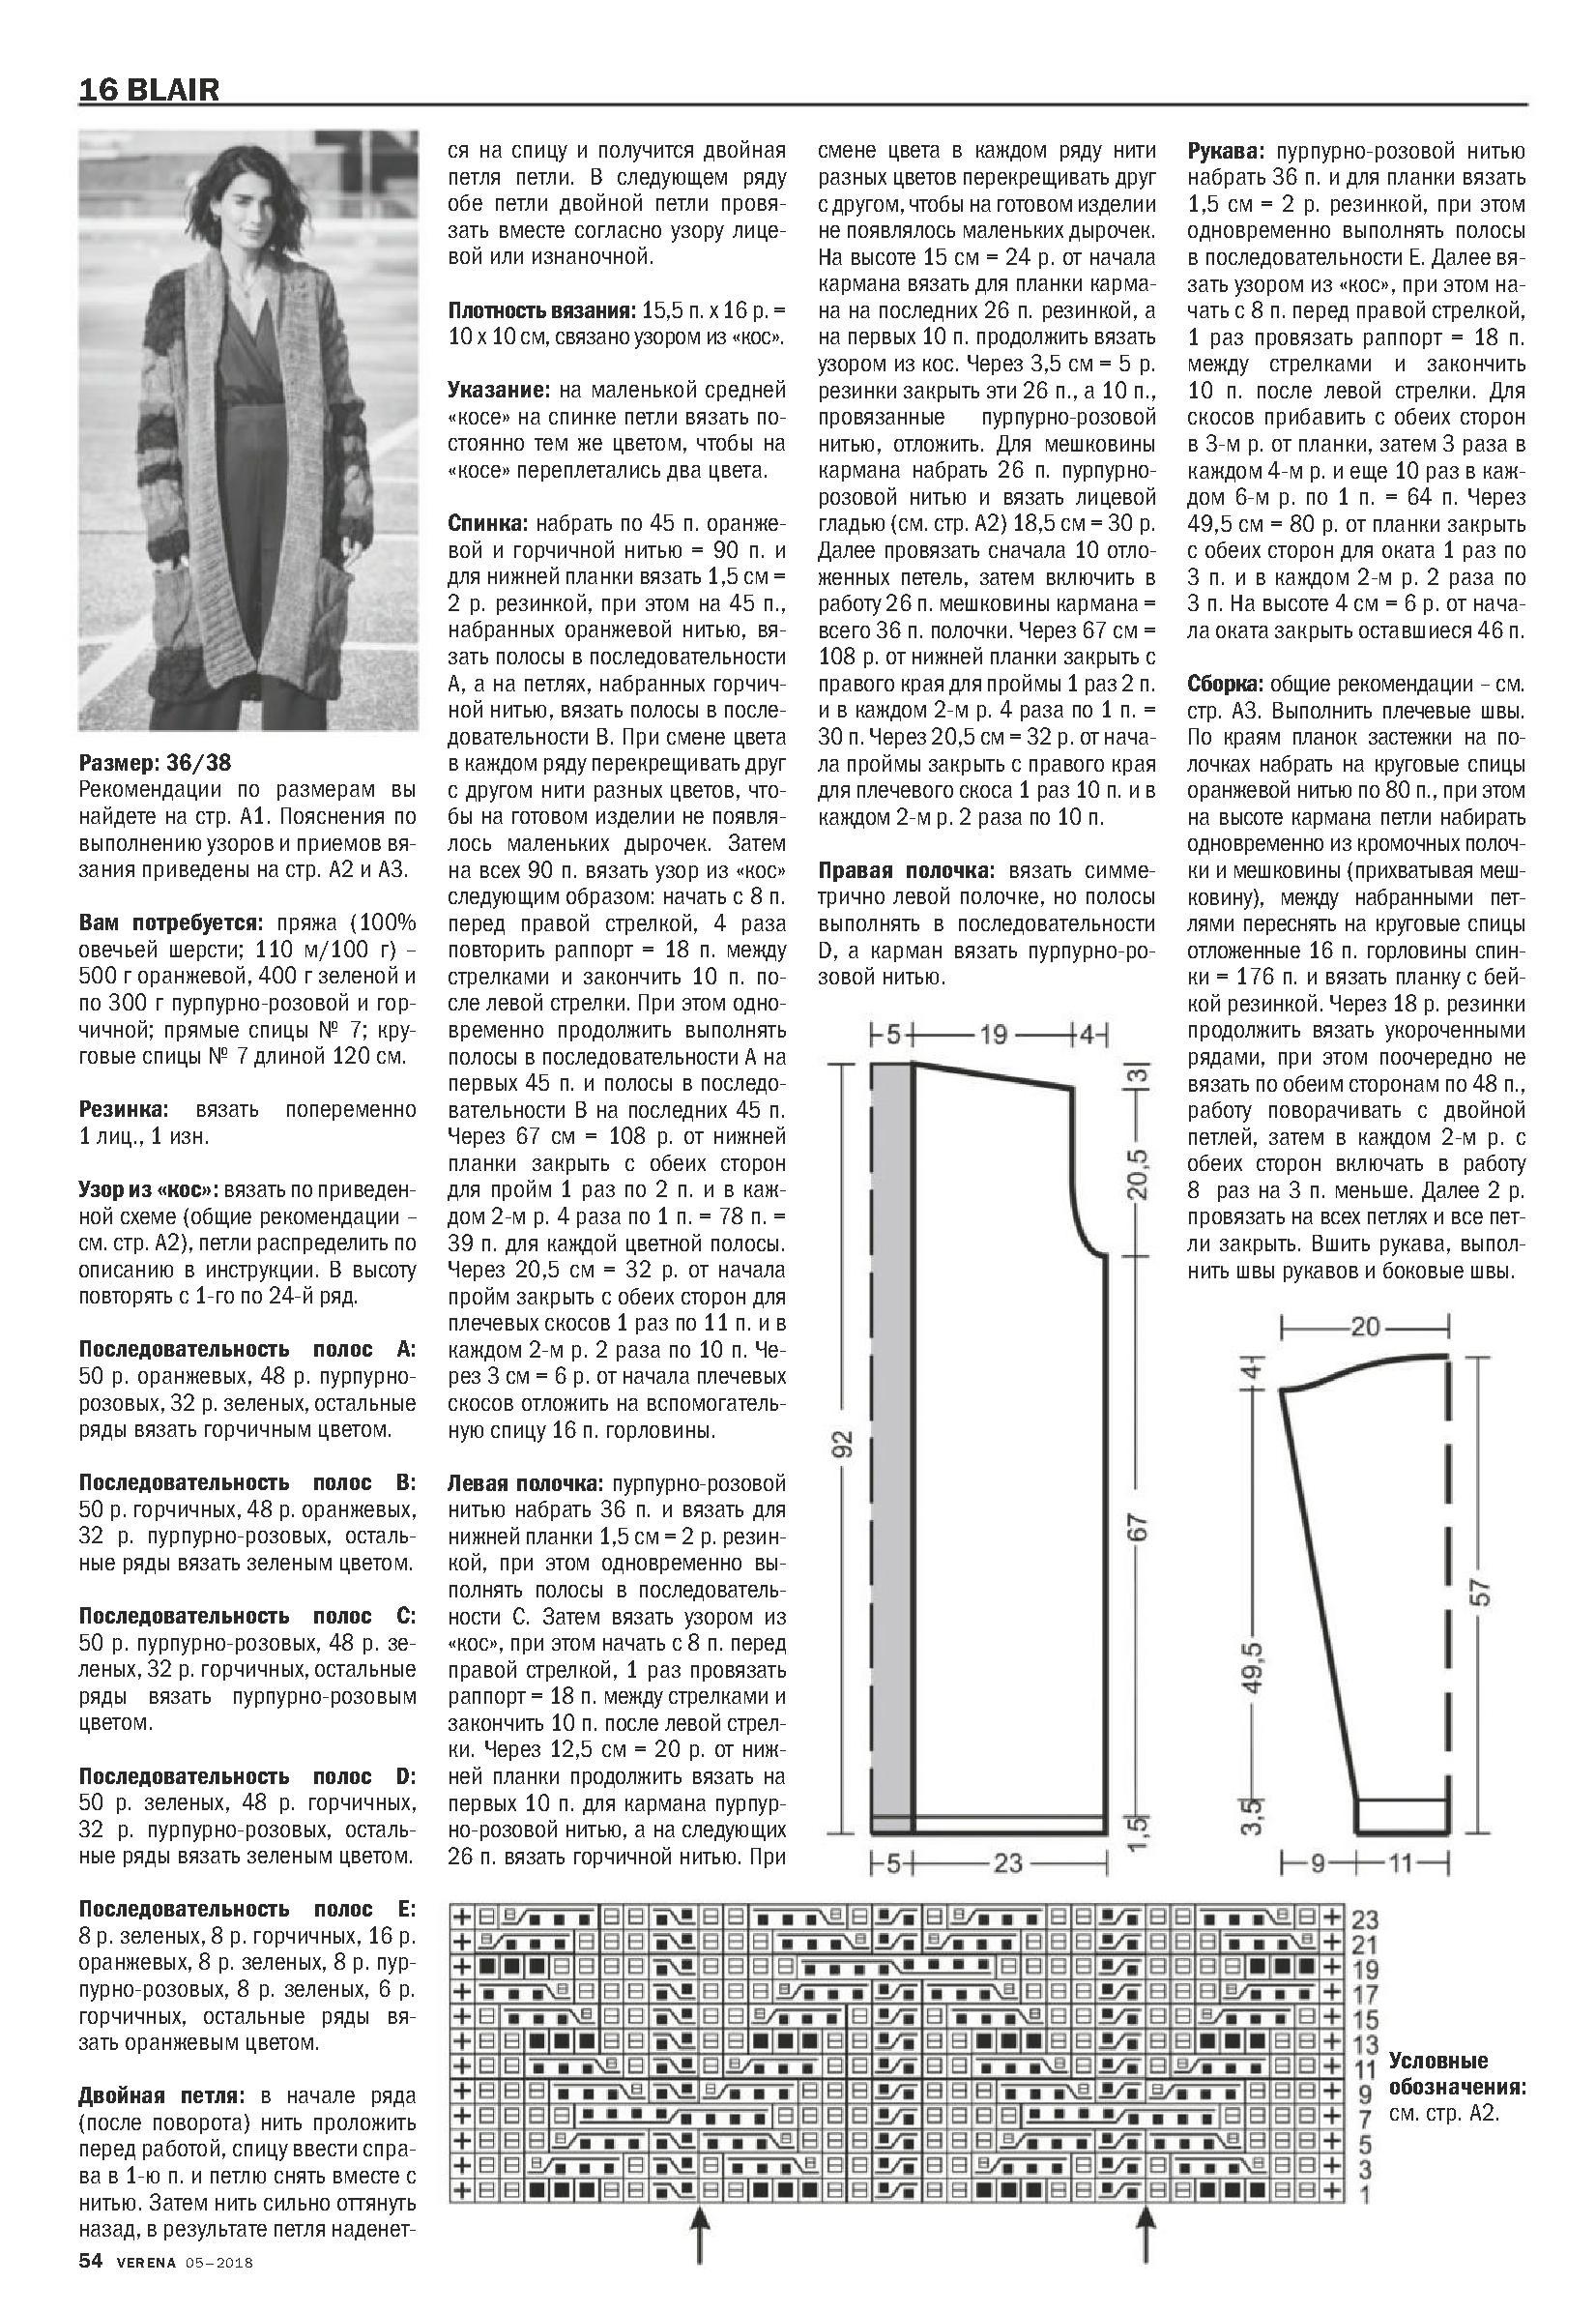 Page_00055.jpg